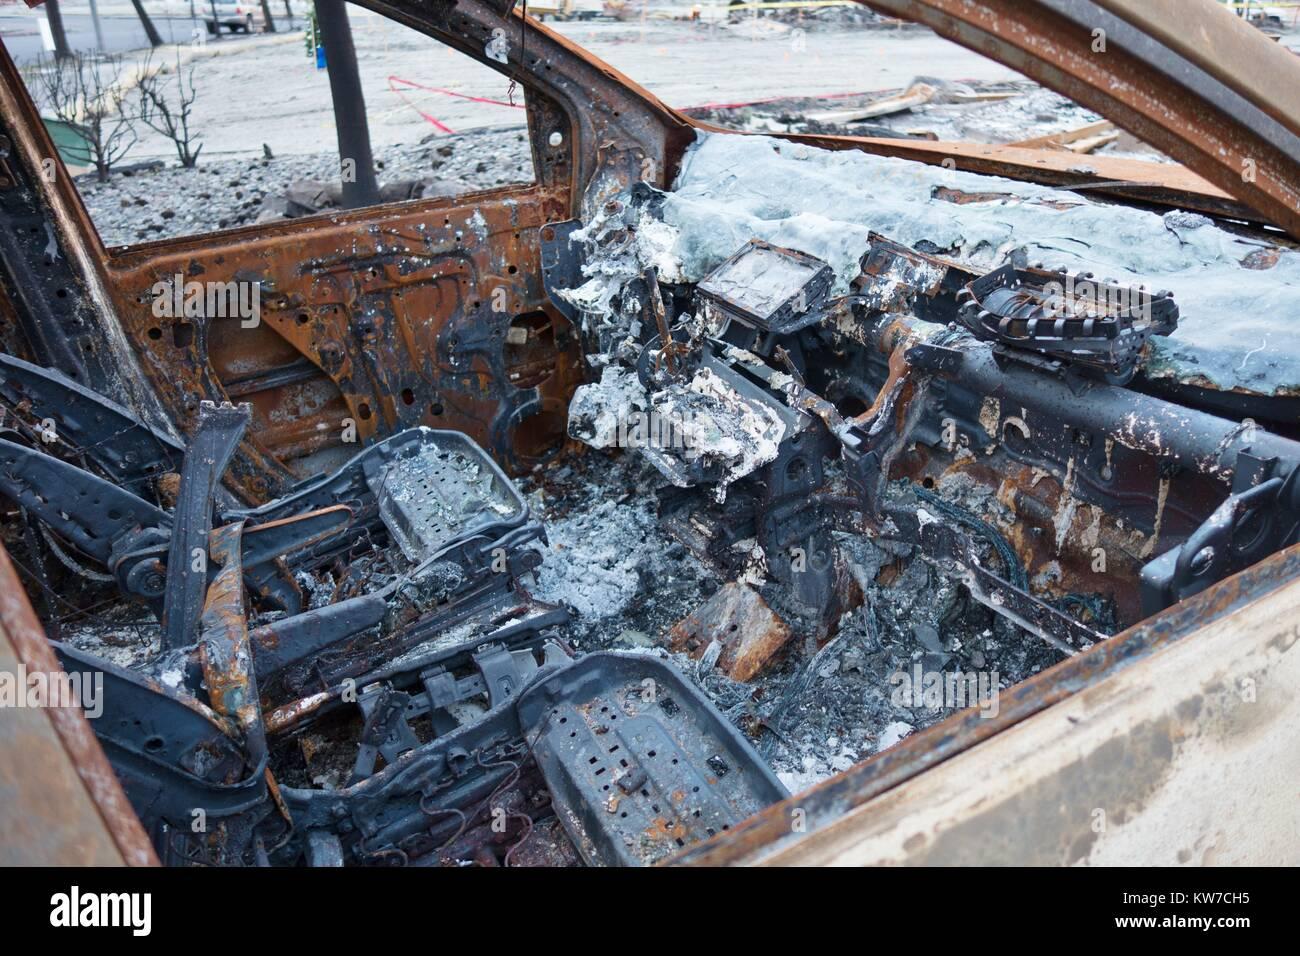 Car Damage Stockfotos & Car Damage Bilder - Seite 2 - Alamy